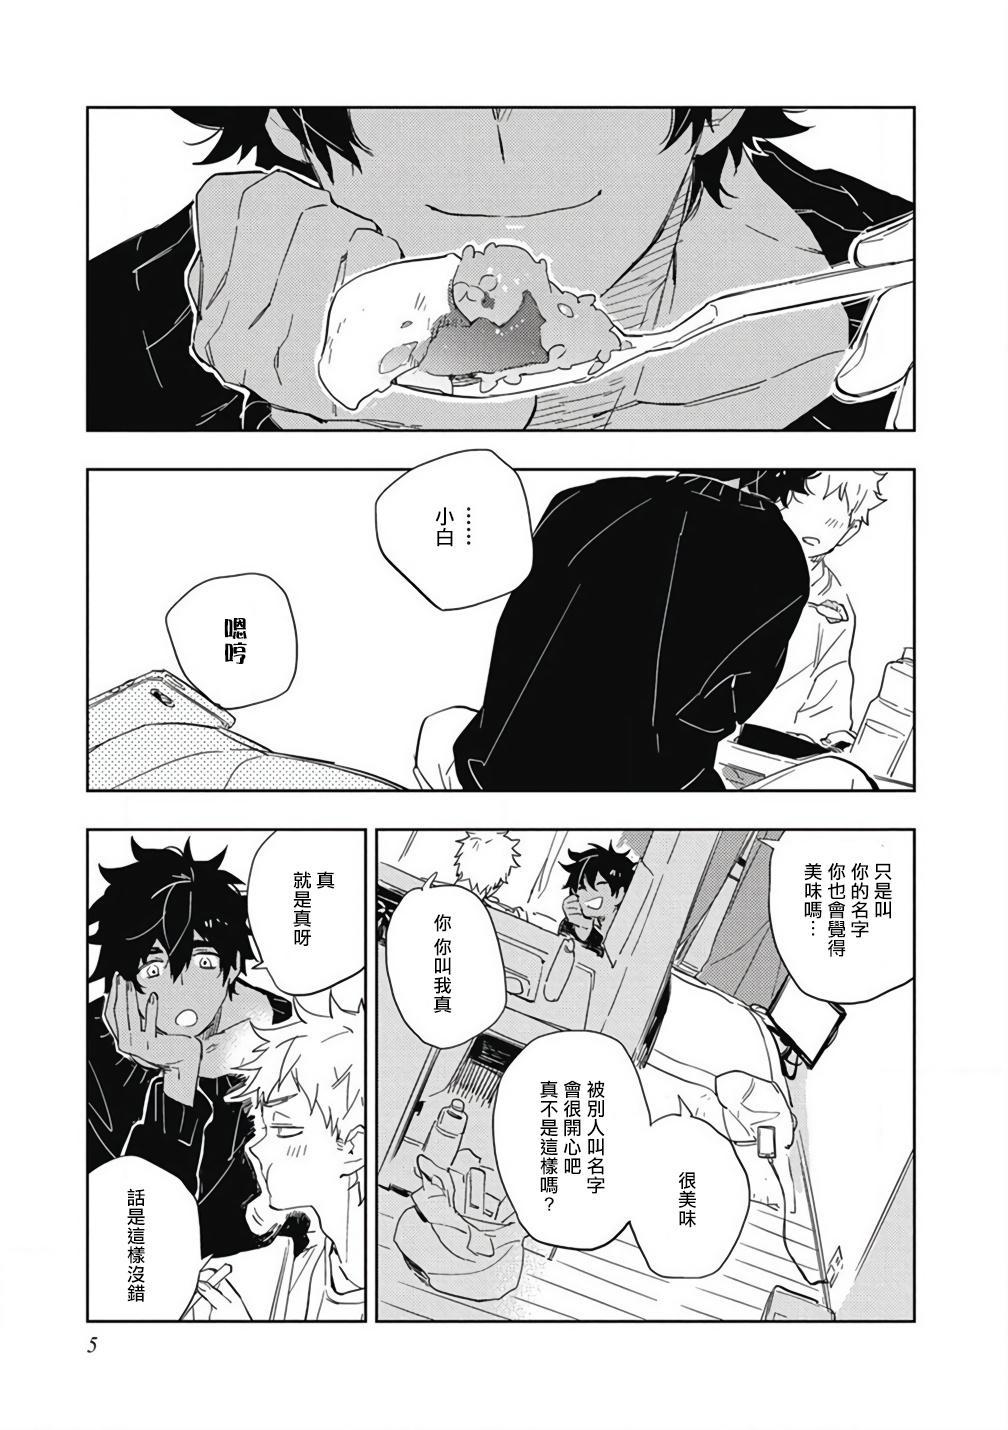 Kimi to Oishii Ai no Kotonoha | 与你一起享用的美味情话 Ch. 1-2 5